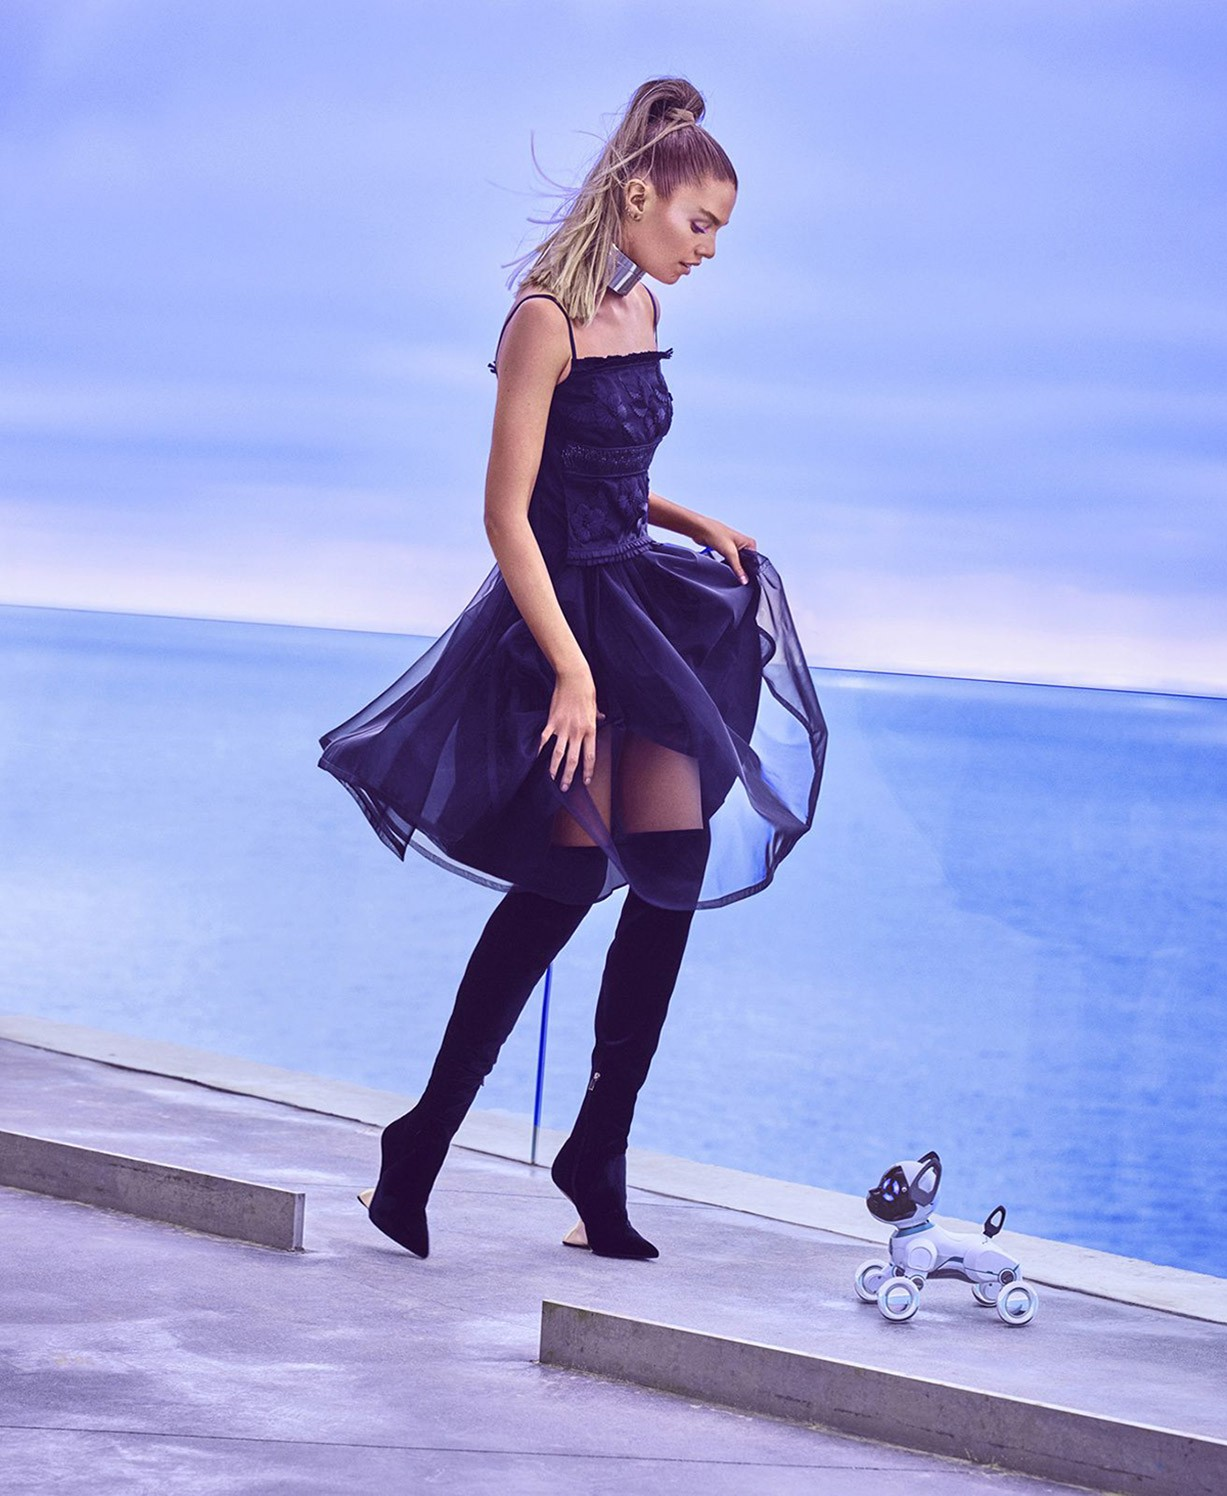 Мир будущего со Стеллой Максвелл / Stella Maxwell by Mariano Vivanco - US Harper's Bazaar November 2017